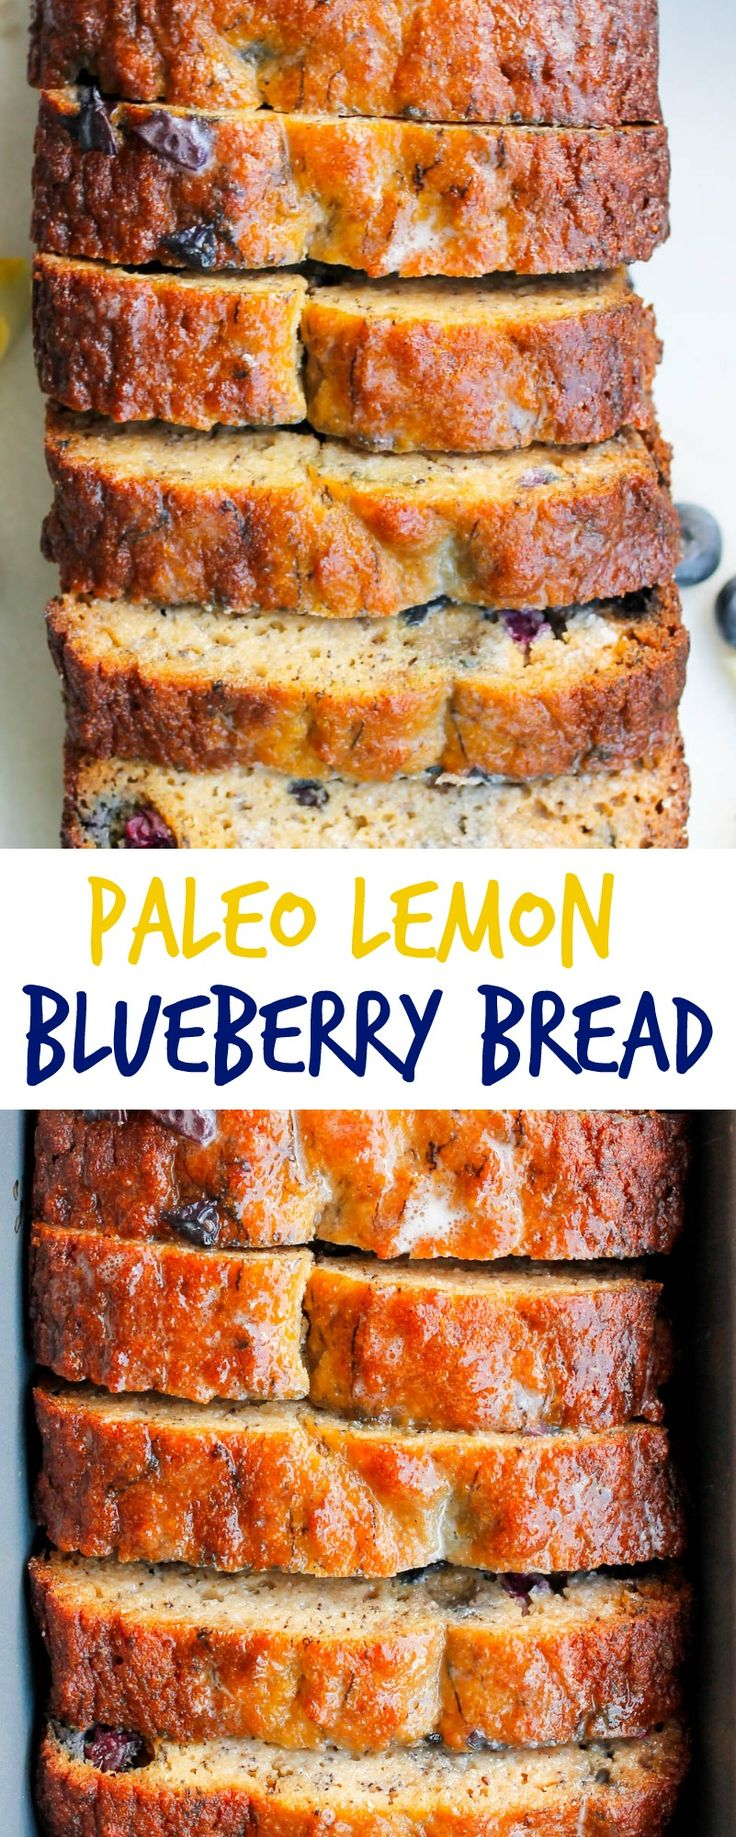 f685d3a65d4e72311a1619575578a143 Paleo Lemon Blueberry Bread